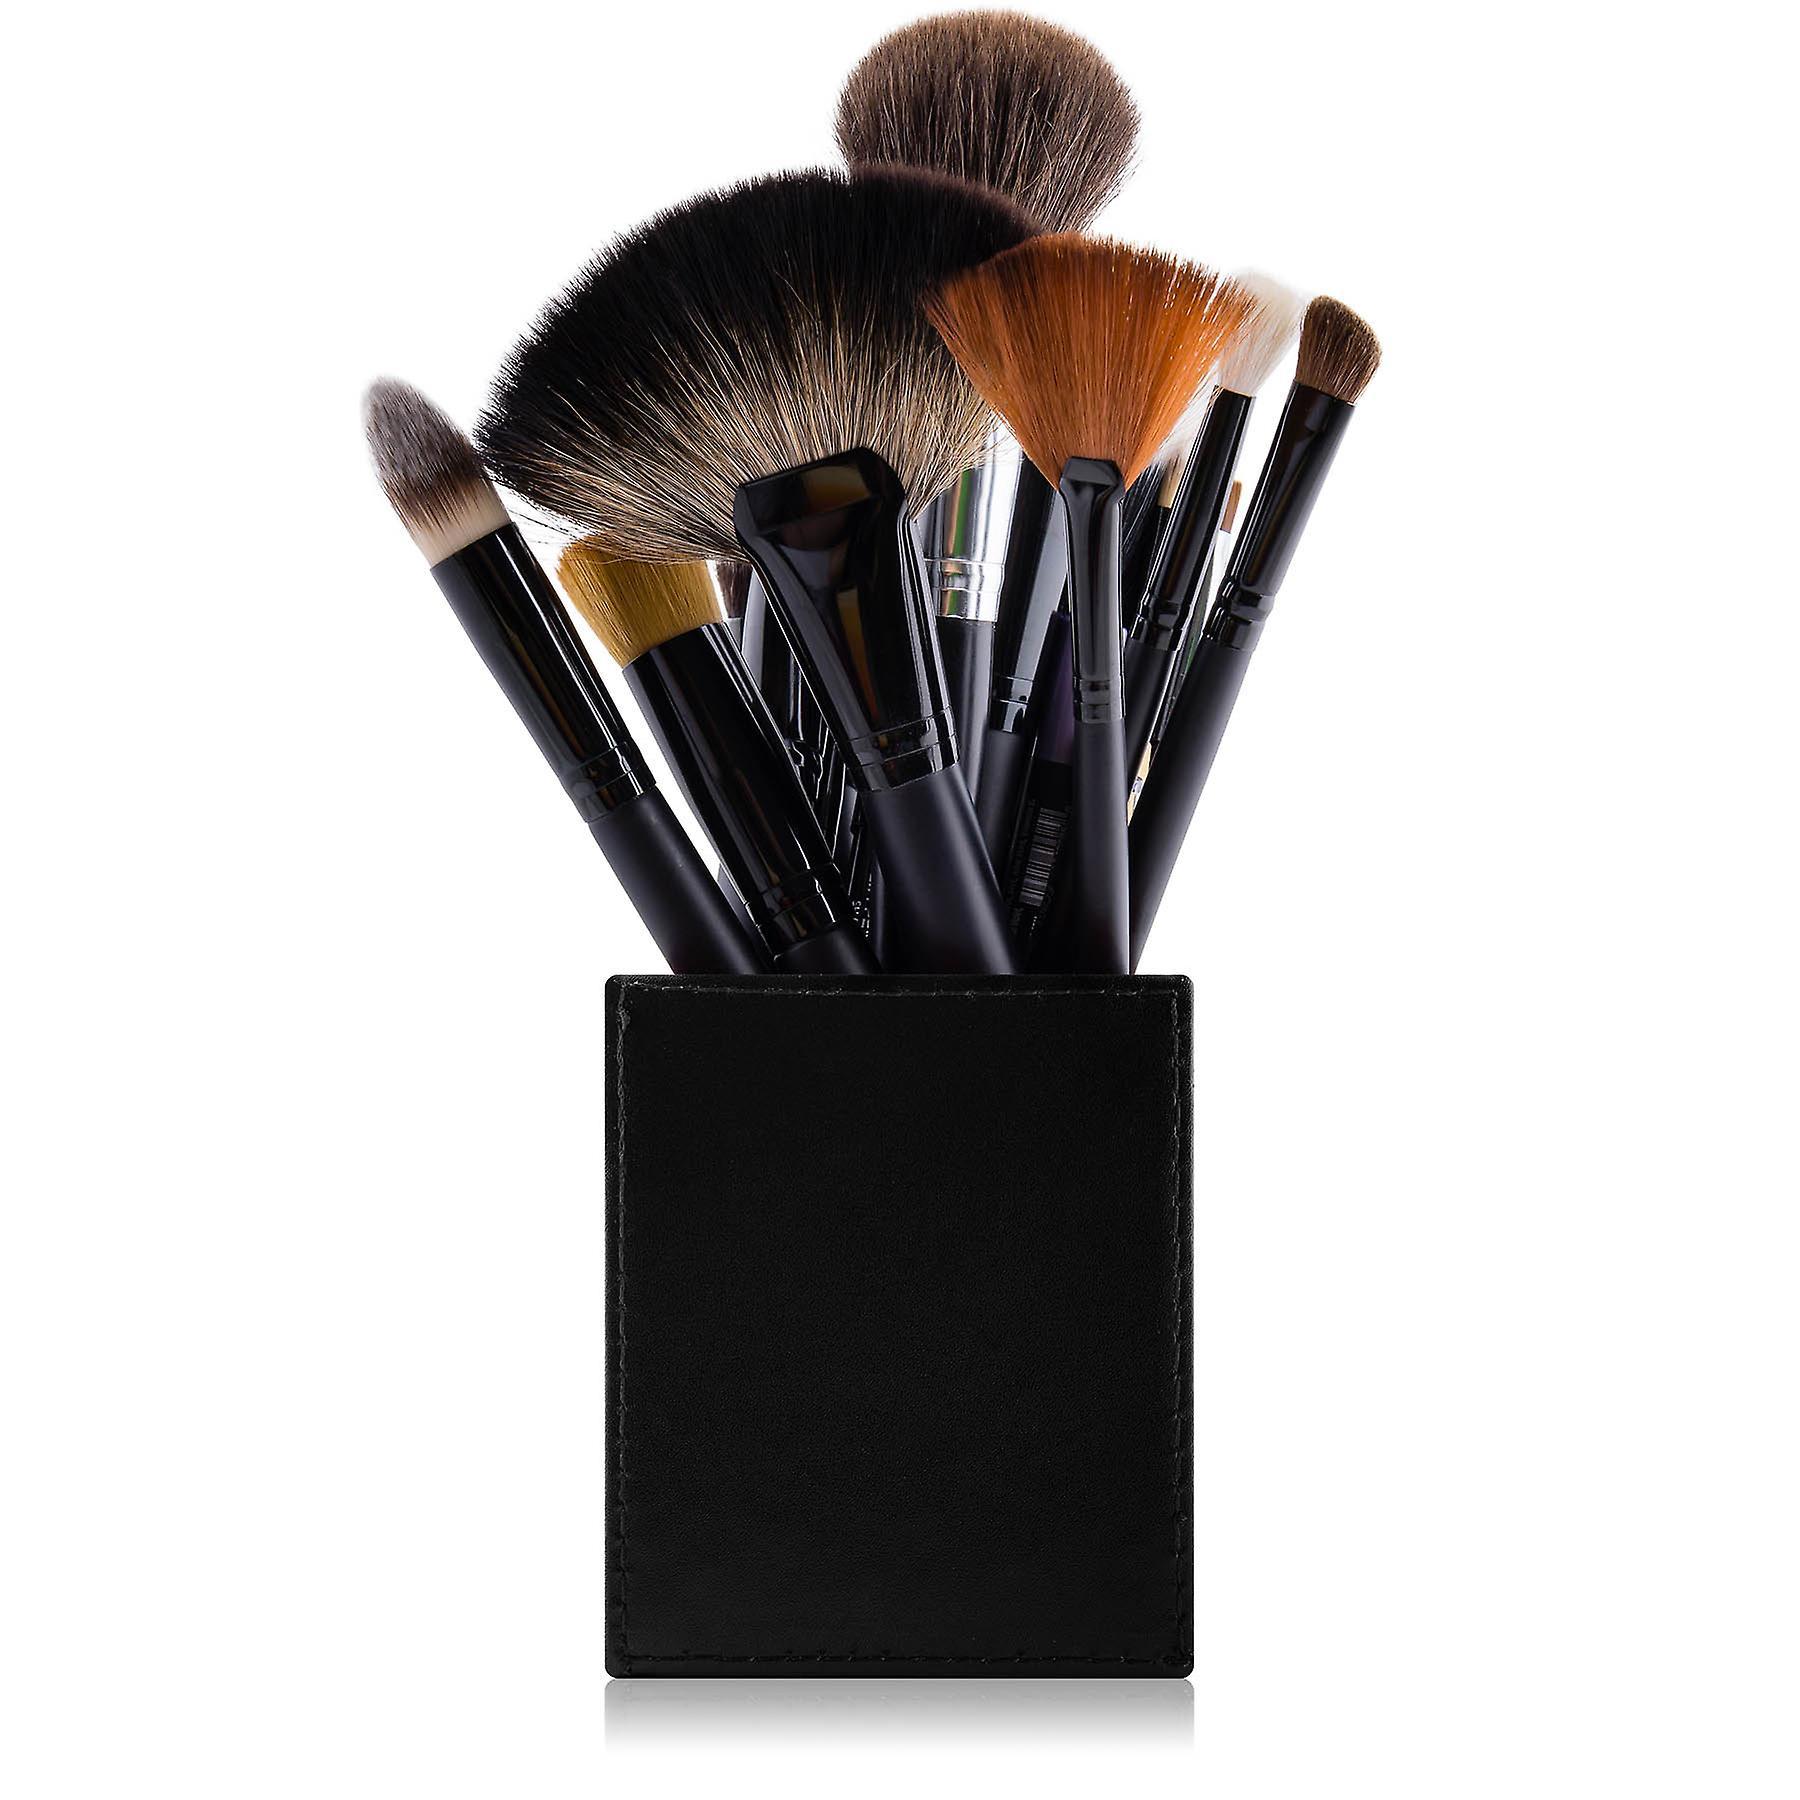 SHANY Cosmetics 2-en-1 Makeup Brush Holder with Removable Cosmetics Organizer Insert - Solution de rangement beauté professionnelle